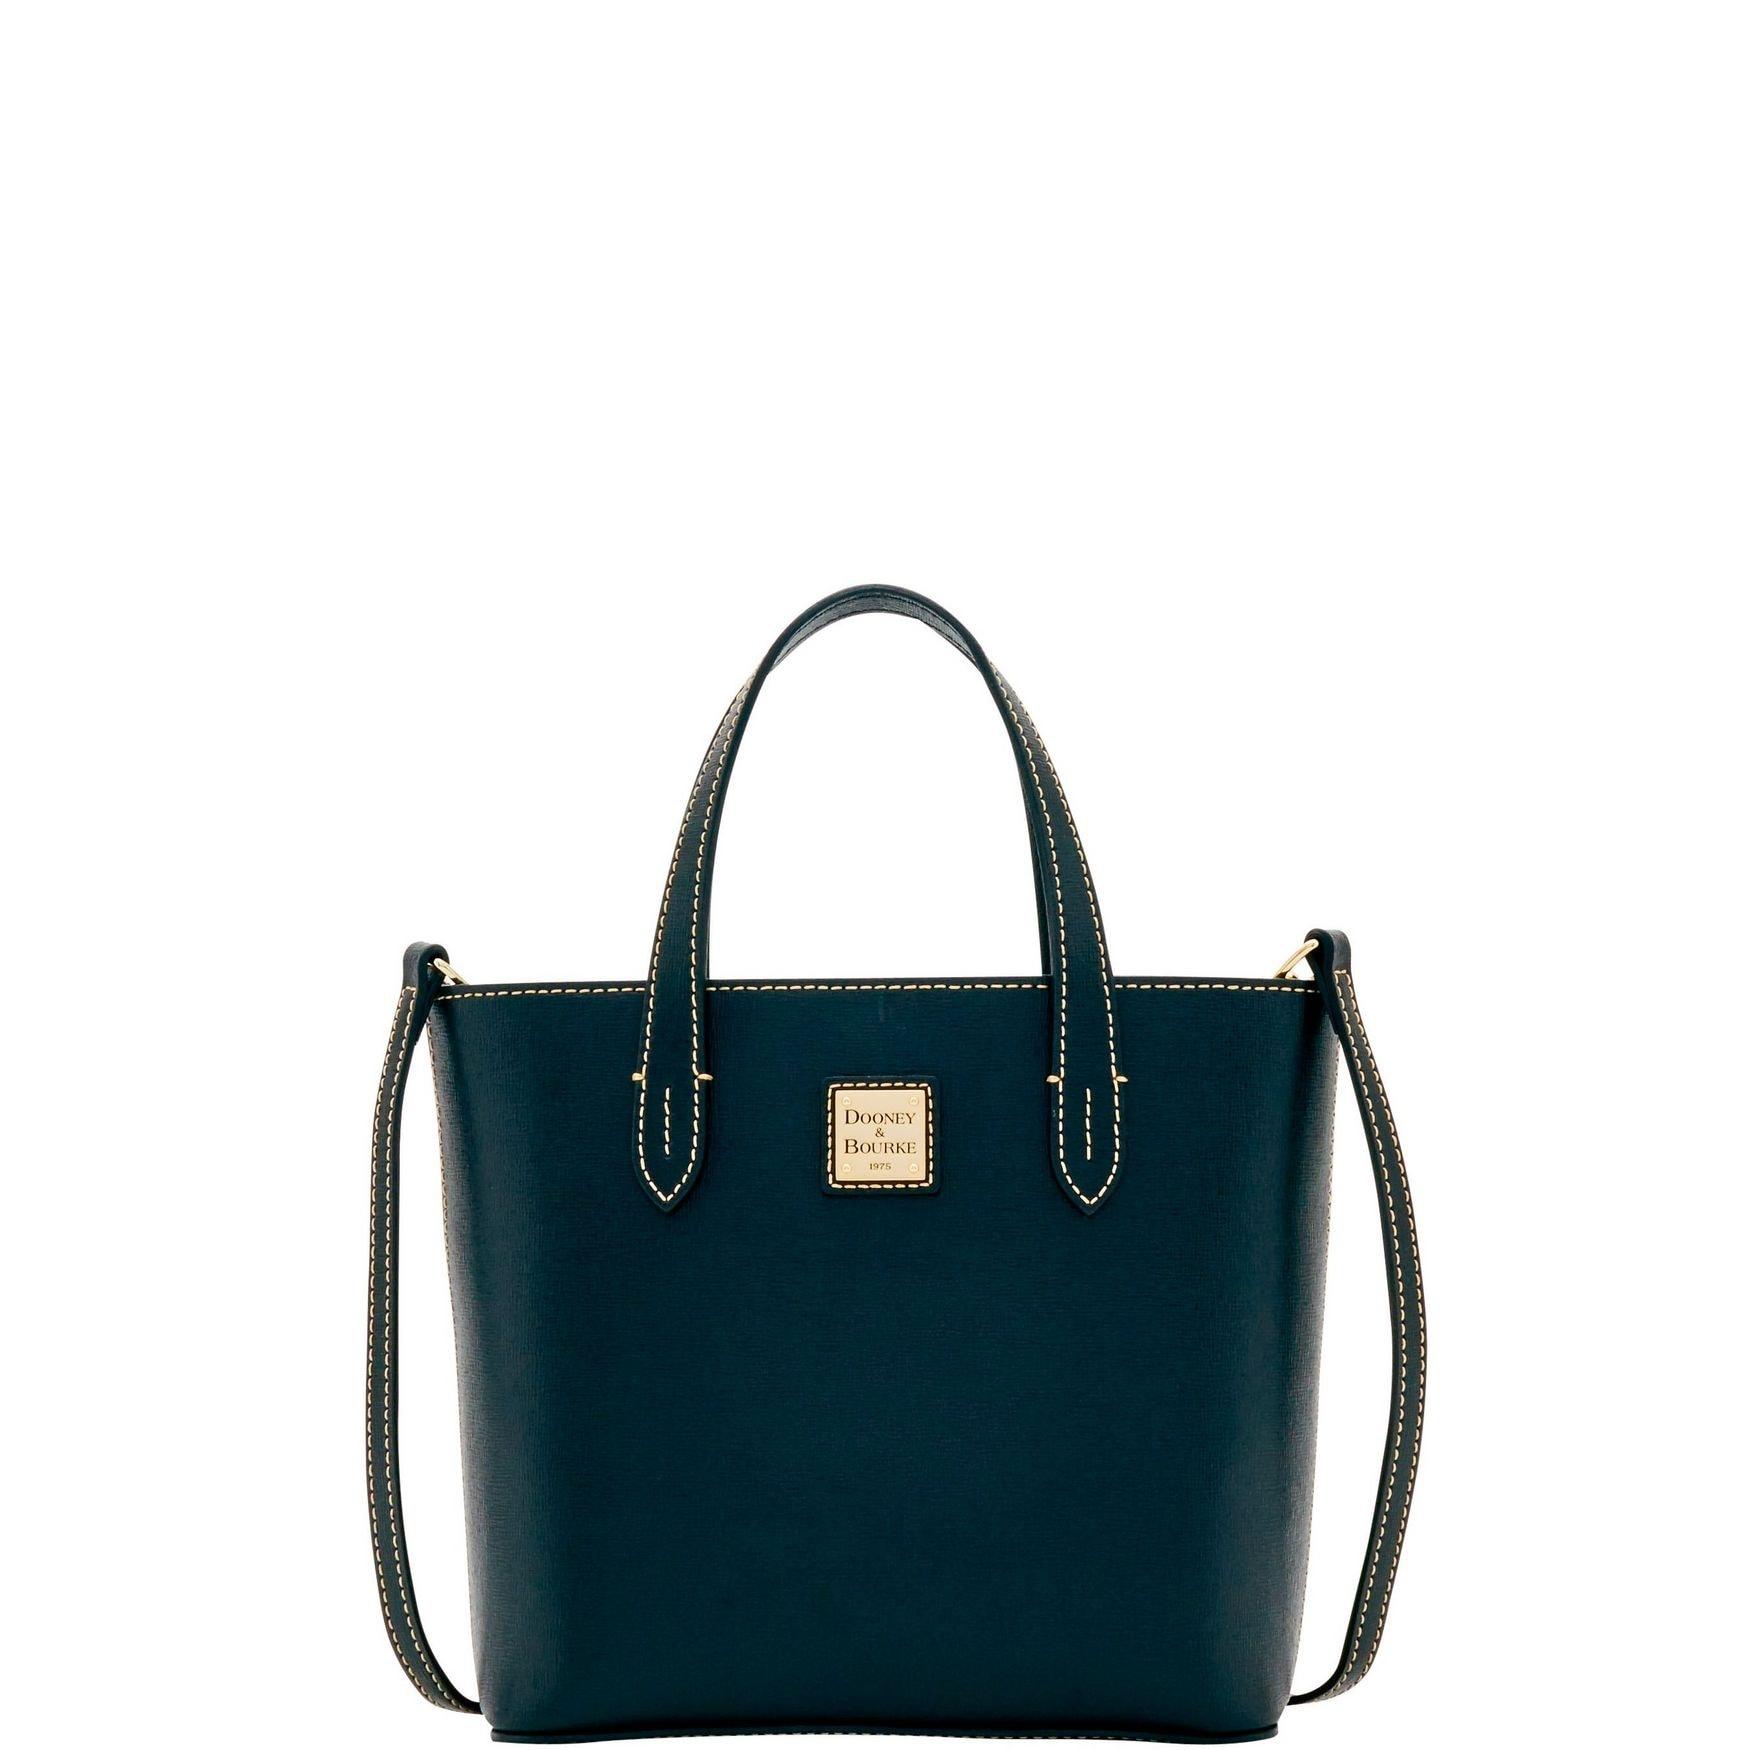 7b758799f4 Designer Handbags | Find Great Designer Store Deals Shopping at Overstock